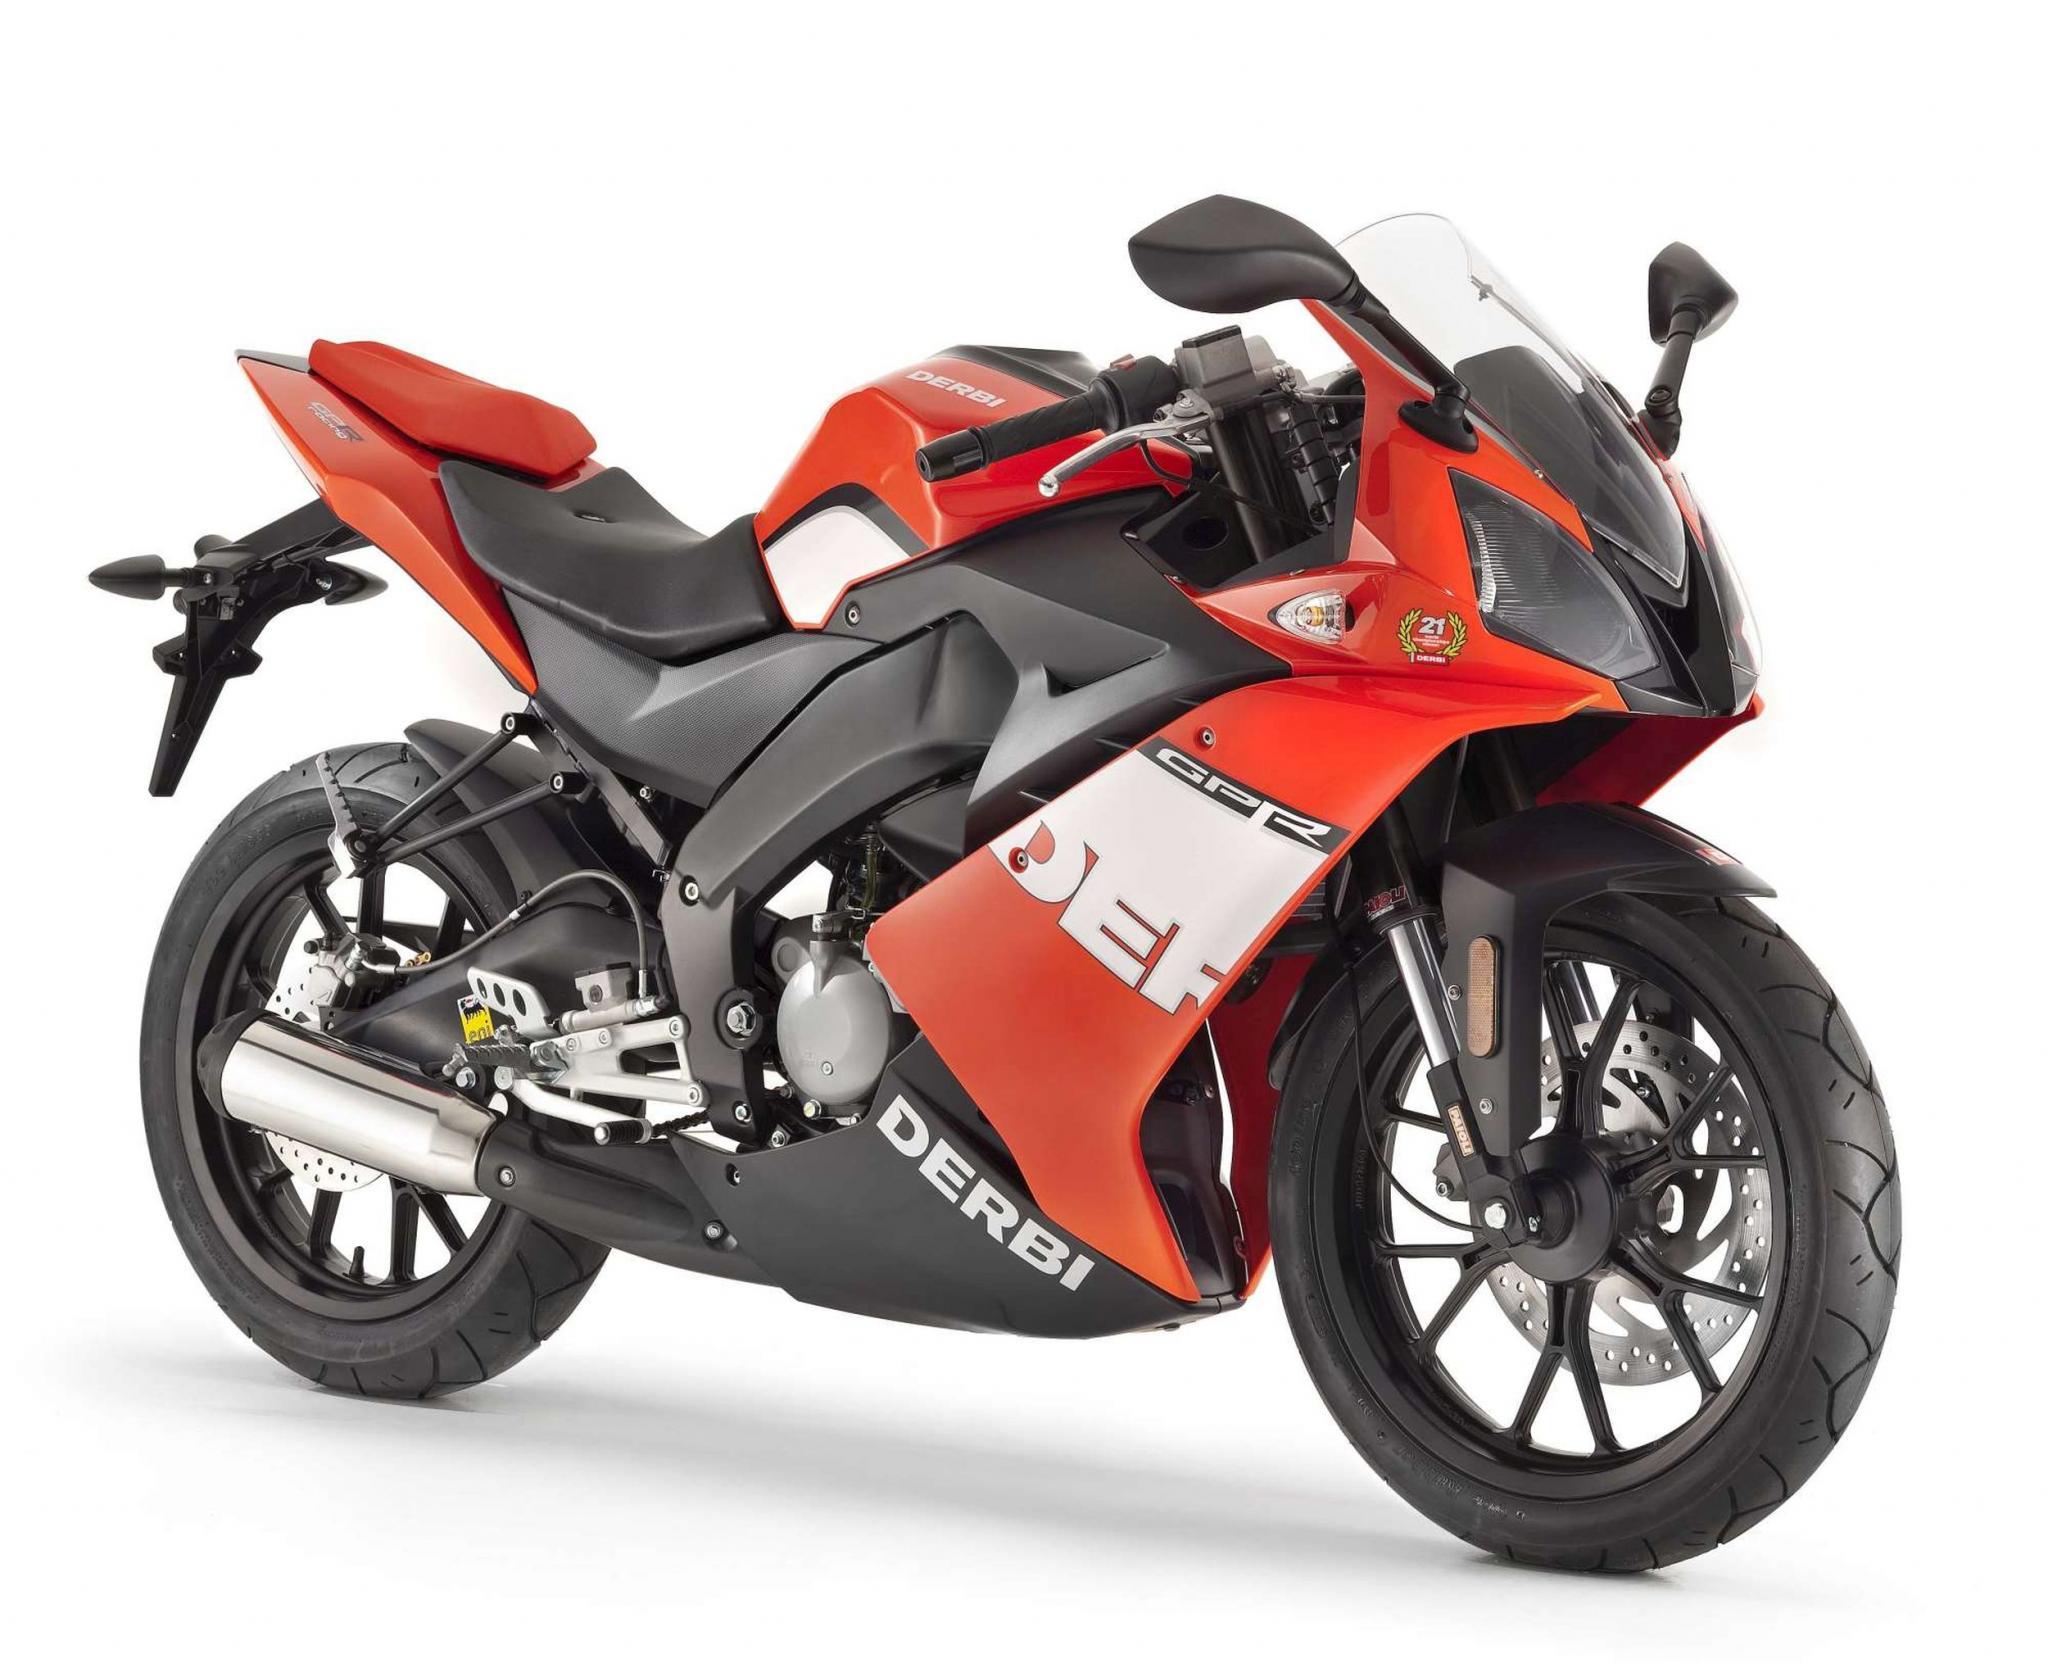 a1 motorr der welches 125er bike passt zu mir motorrad. Black Bedroom Furniture Sets. Home Design Ideas